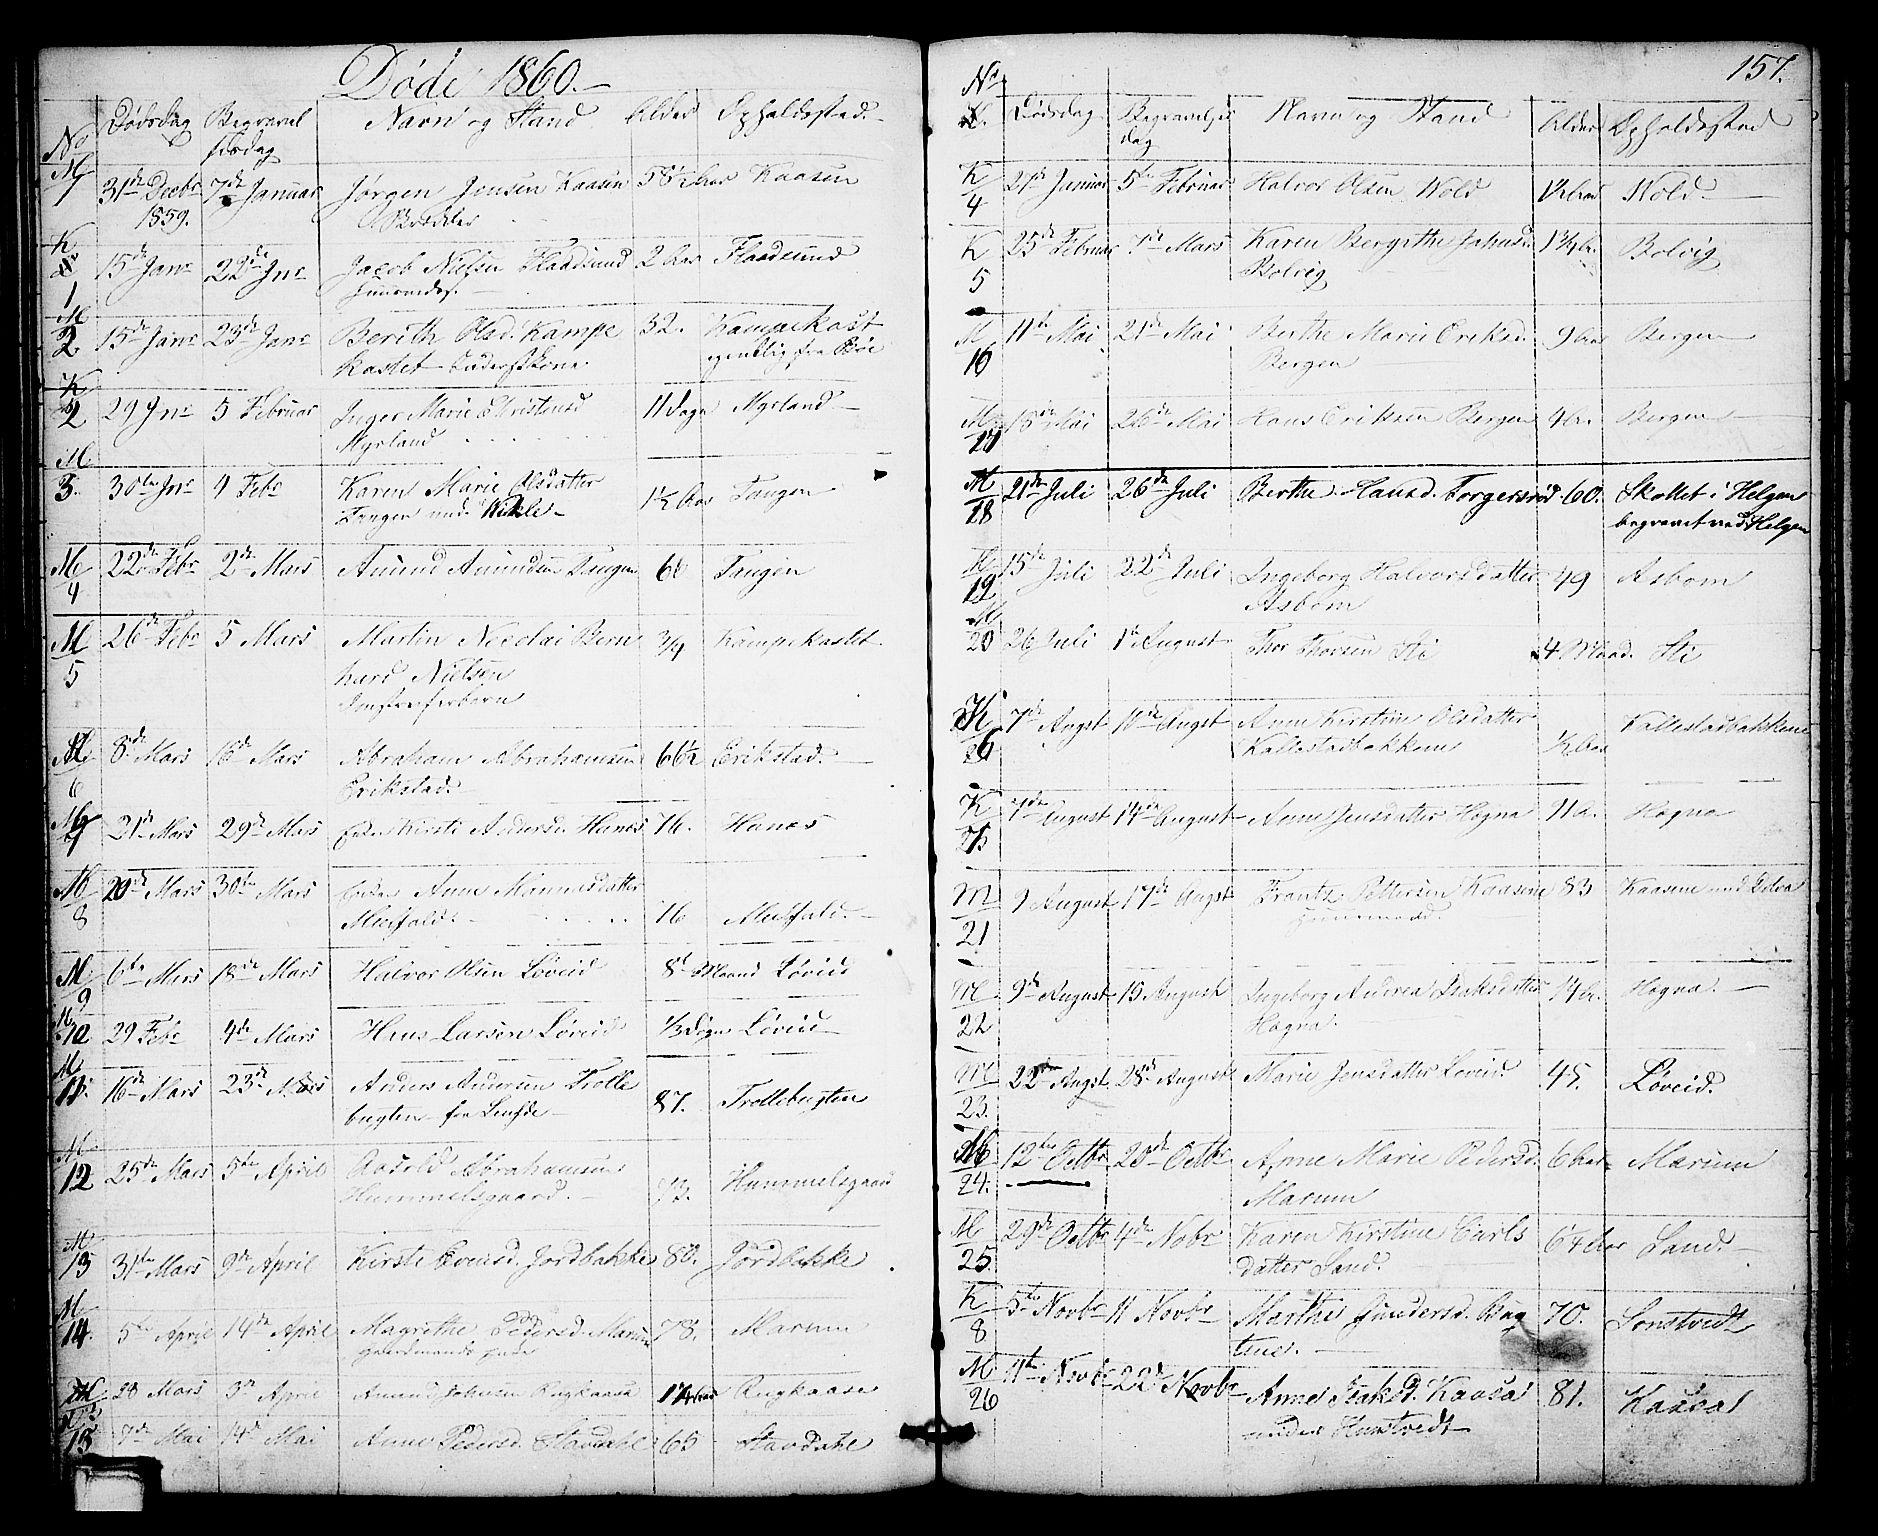 SAKO, Solum kirkebøker, G/Gb/L0002: Klokkerbok nr. II 2, 1859-1879, s. 157